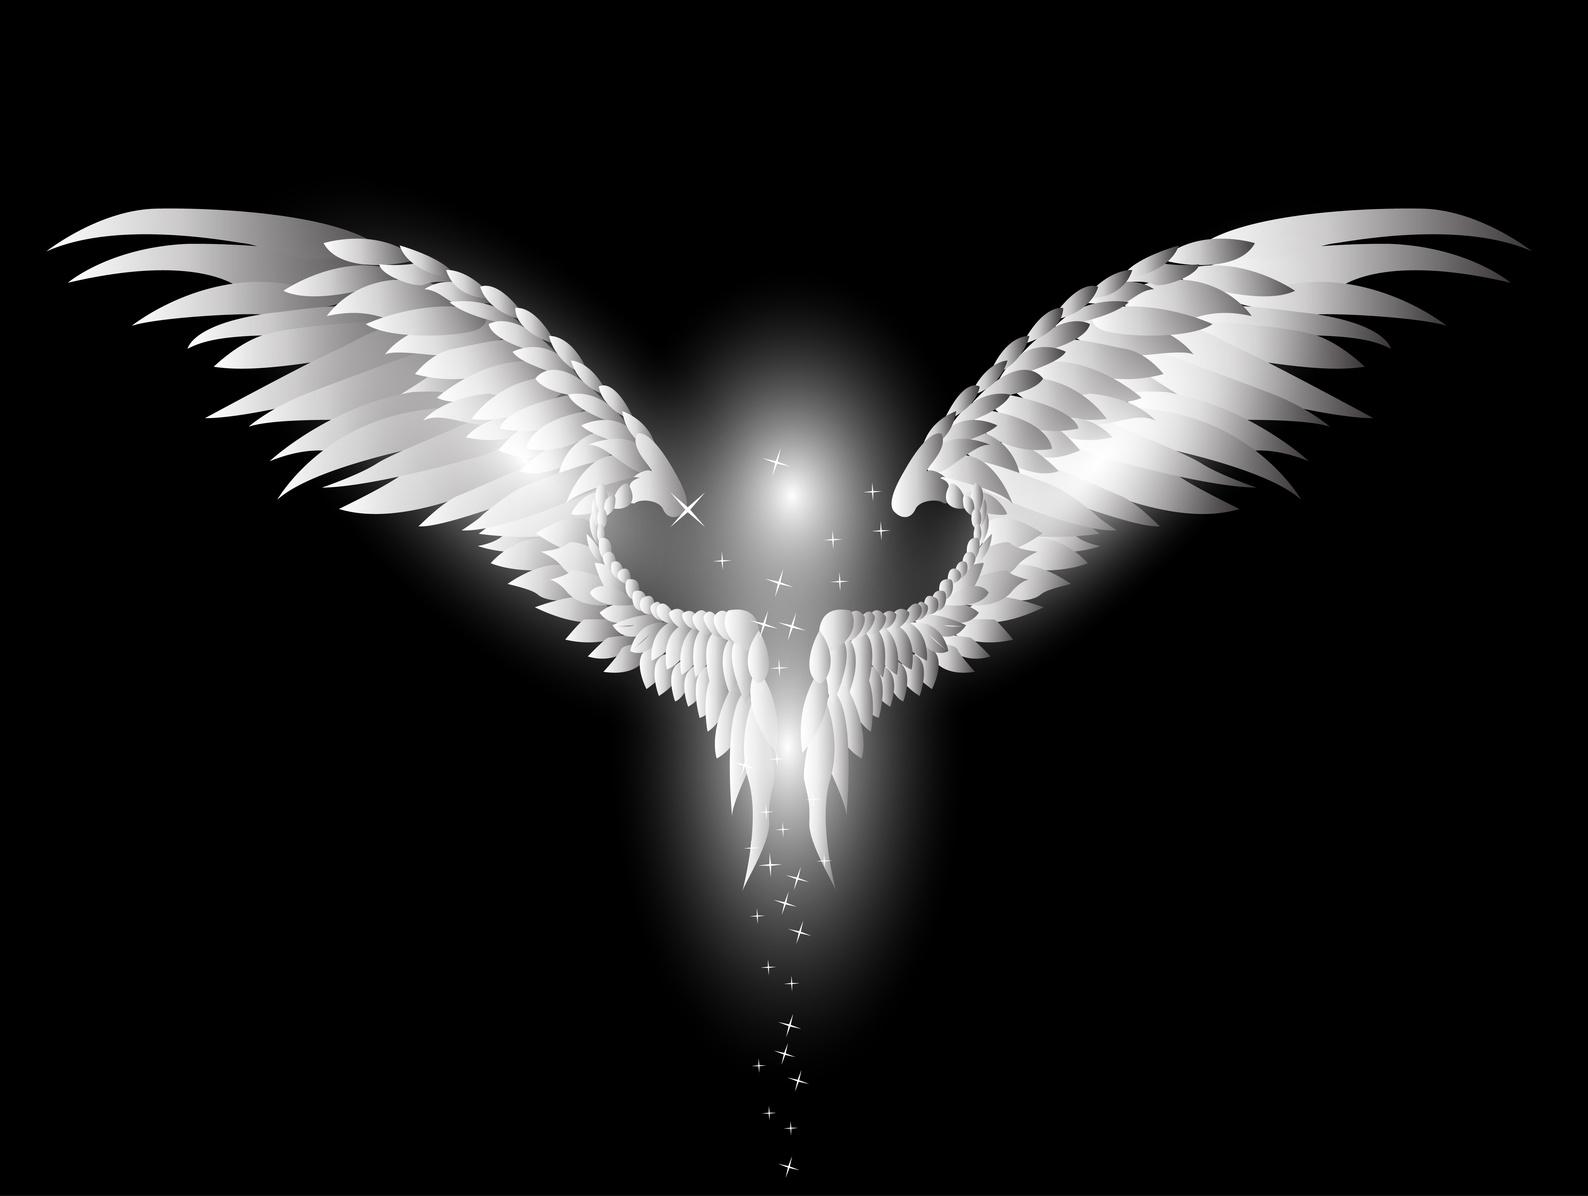 Ange Image ange - term paper example - ezhomeworkmqba.desarrollosweb